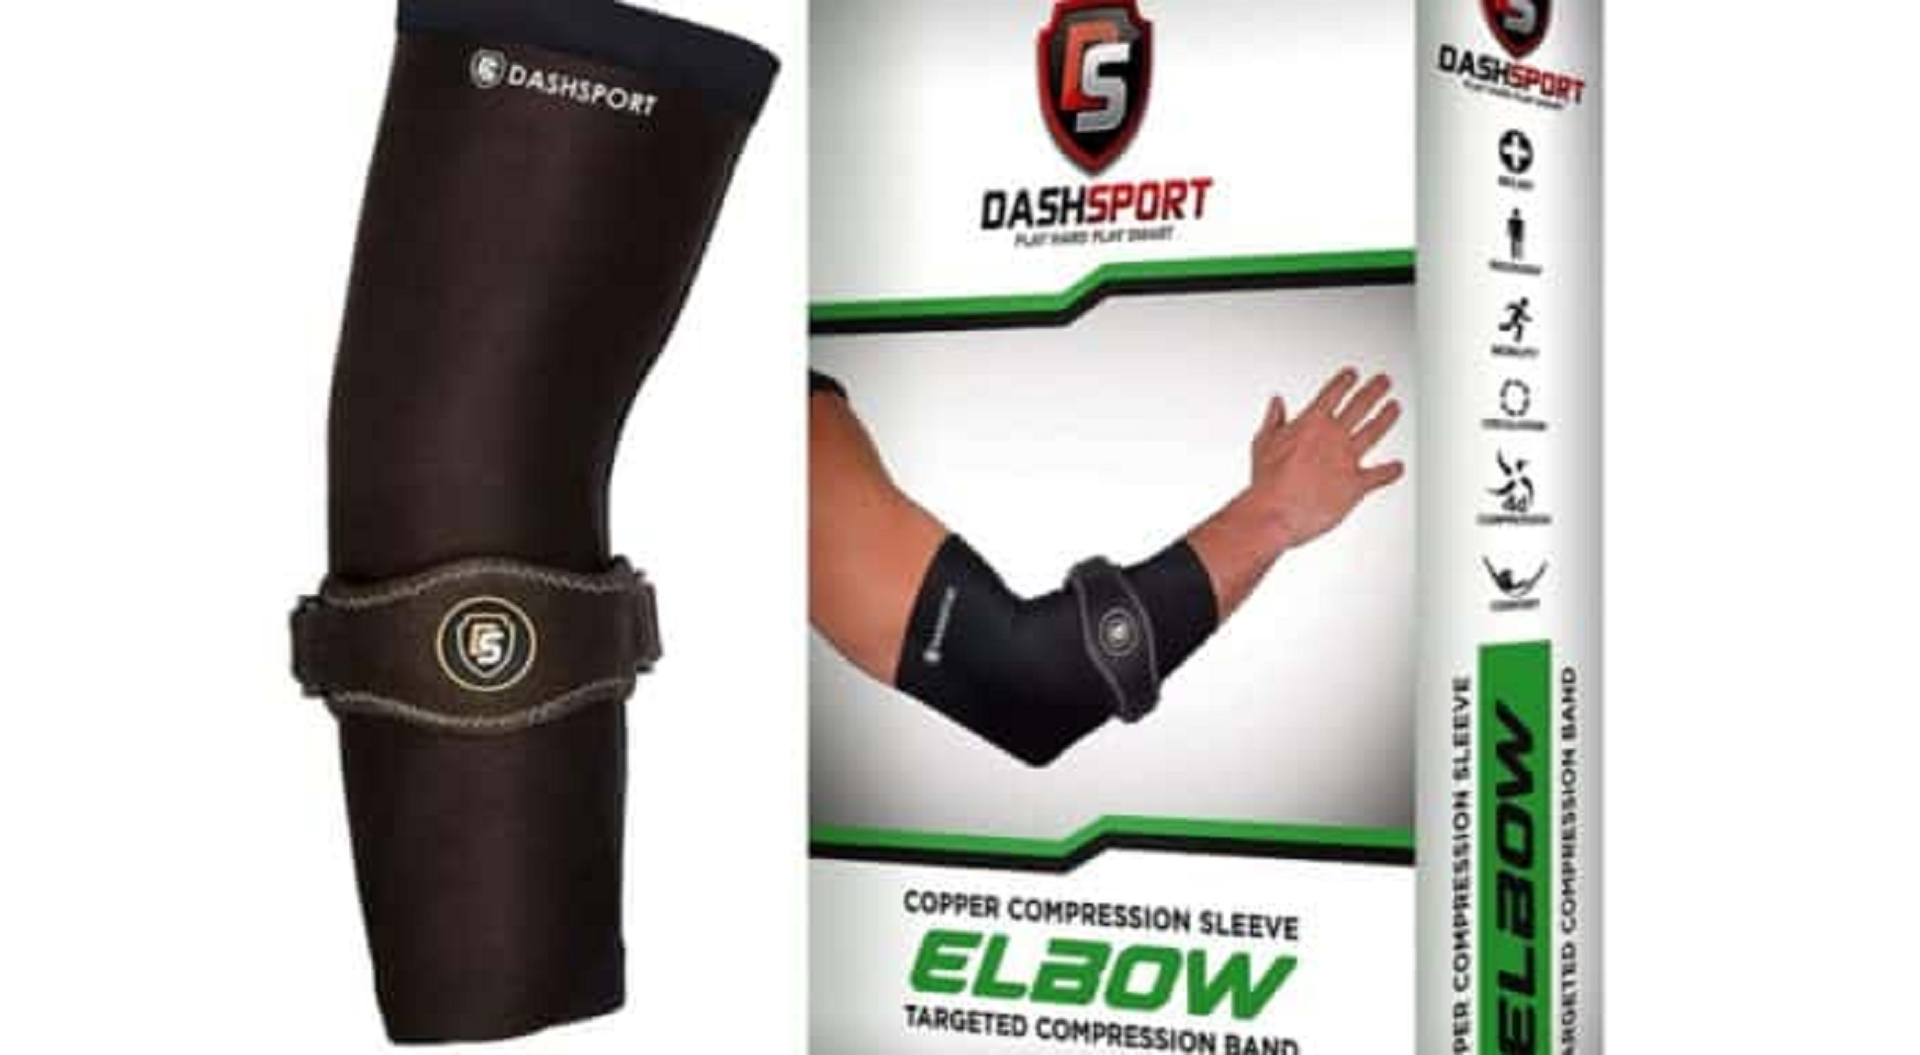 dashsport tennis elbow sleeve